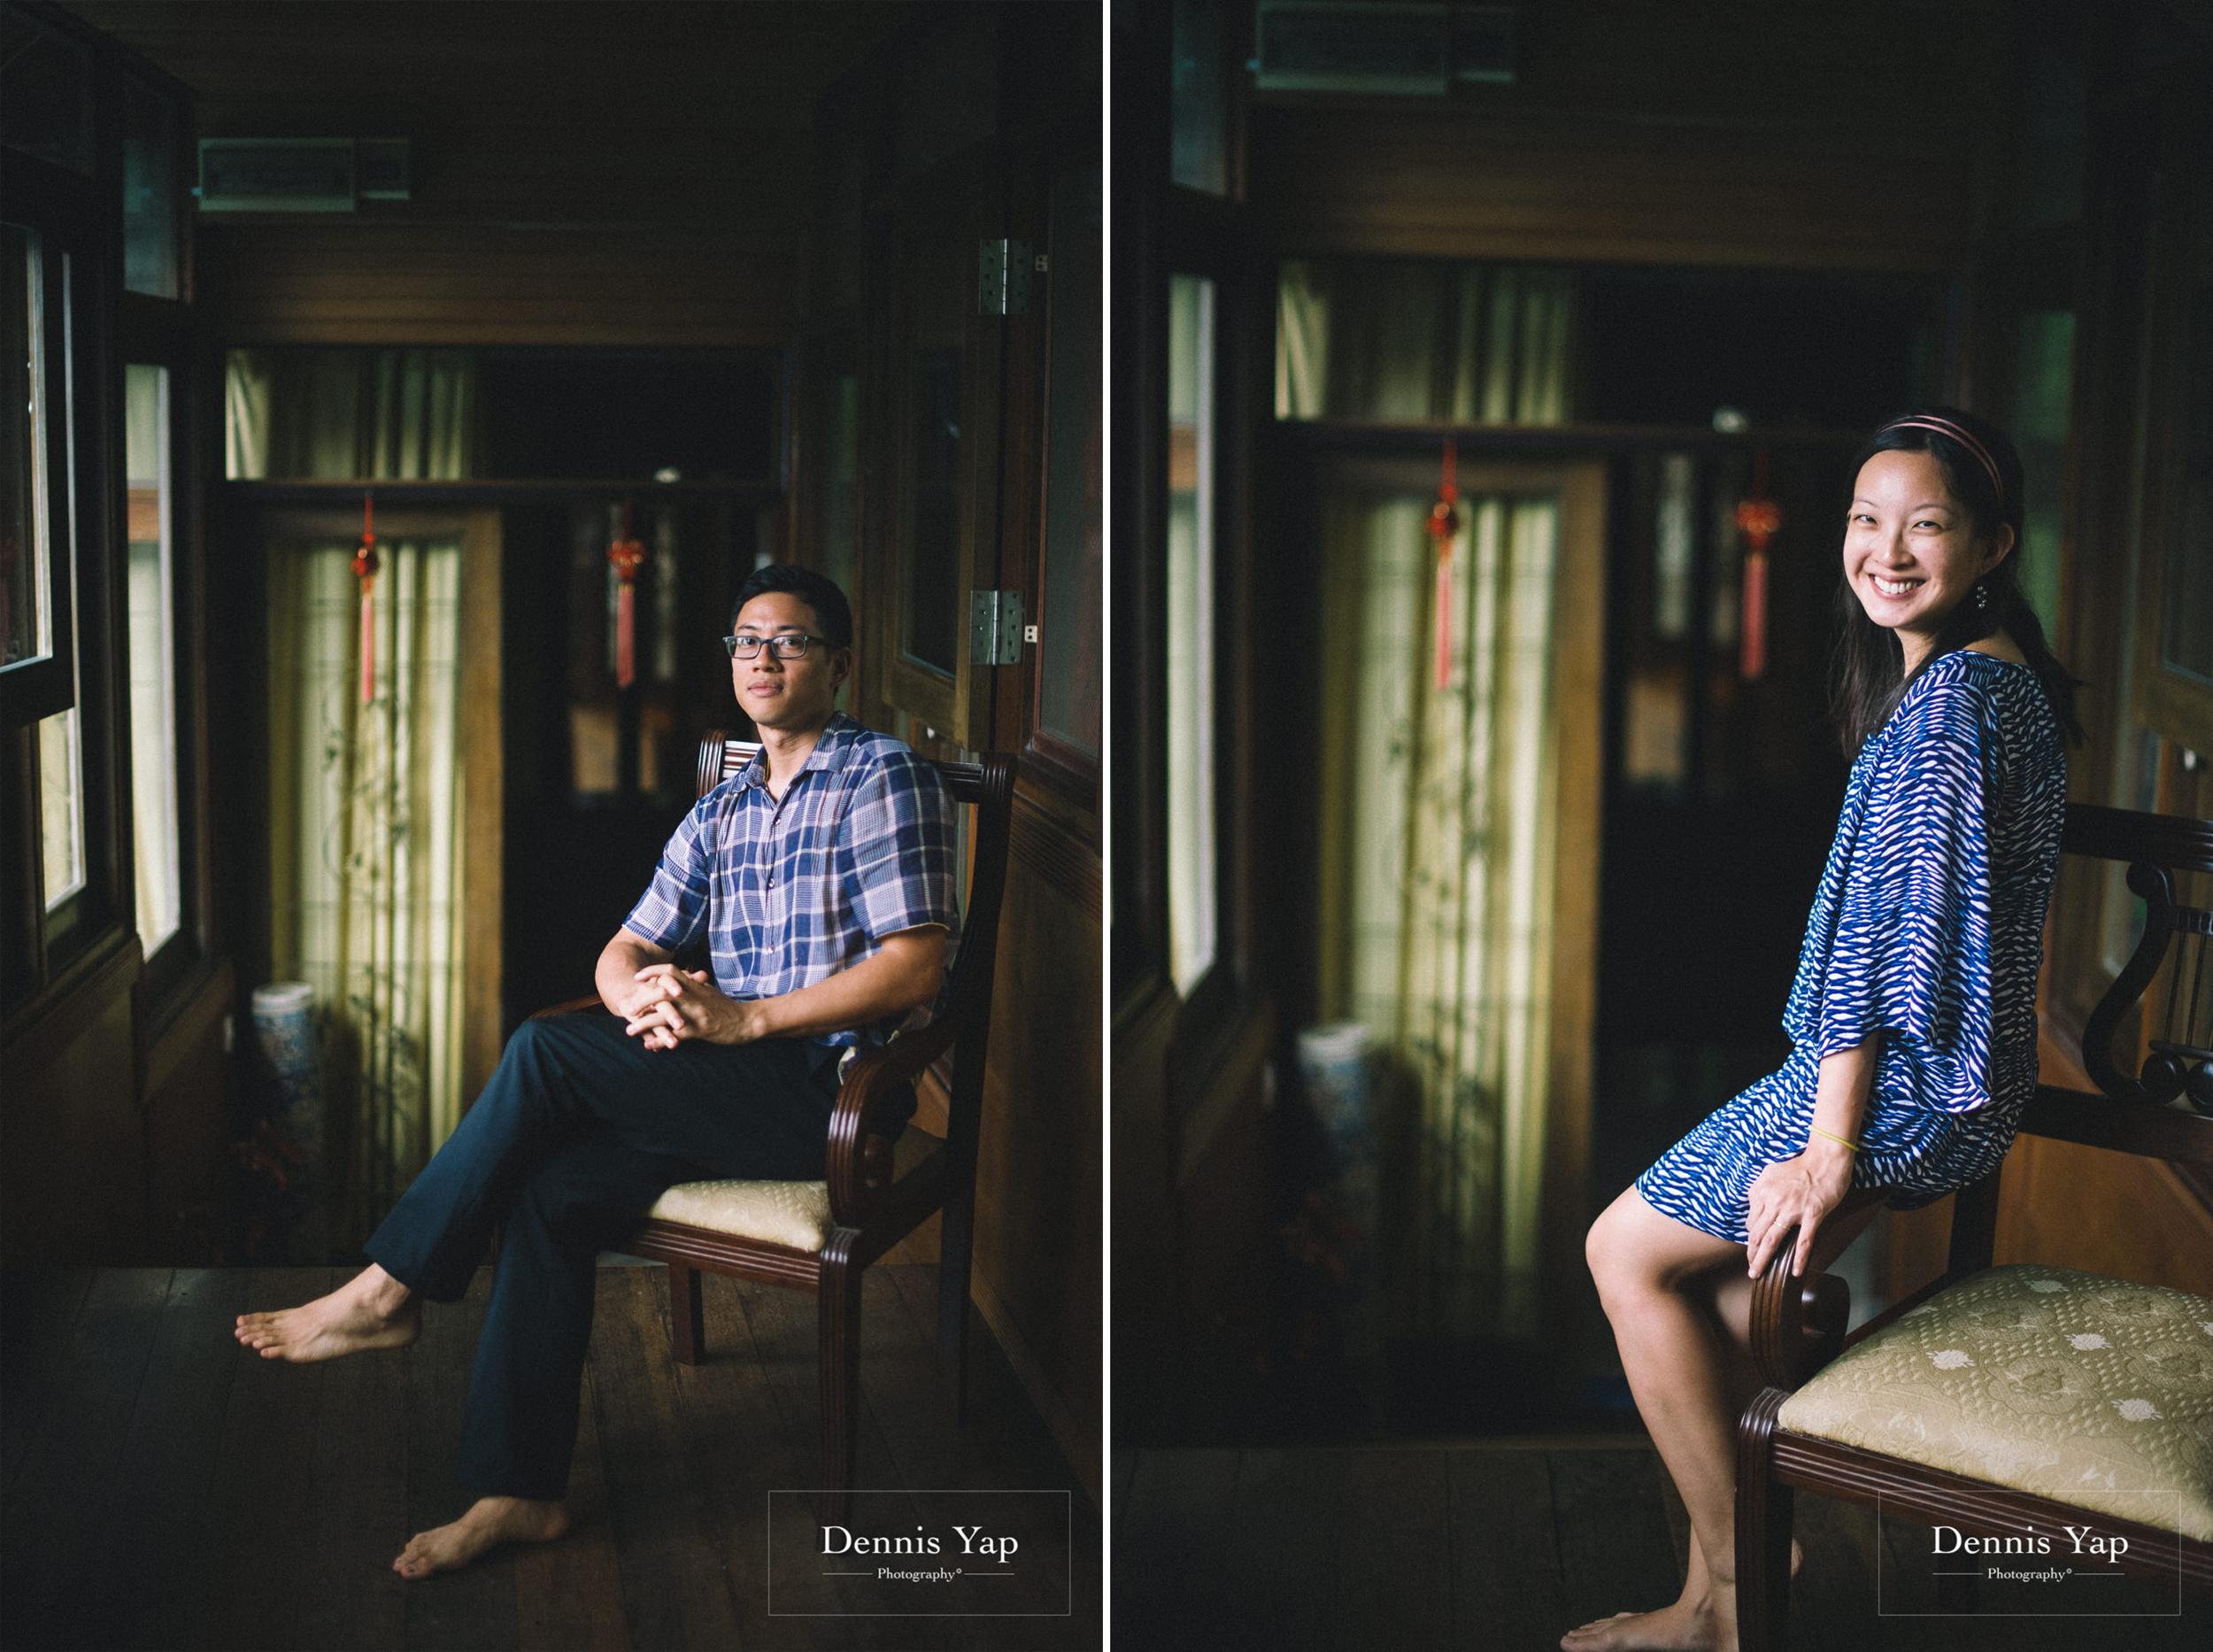 thong family chuen thong portrait beloved dennis yap photography-16.jpg